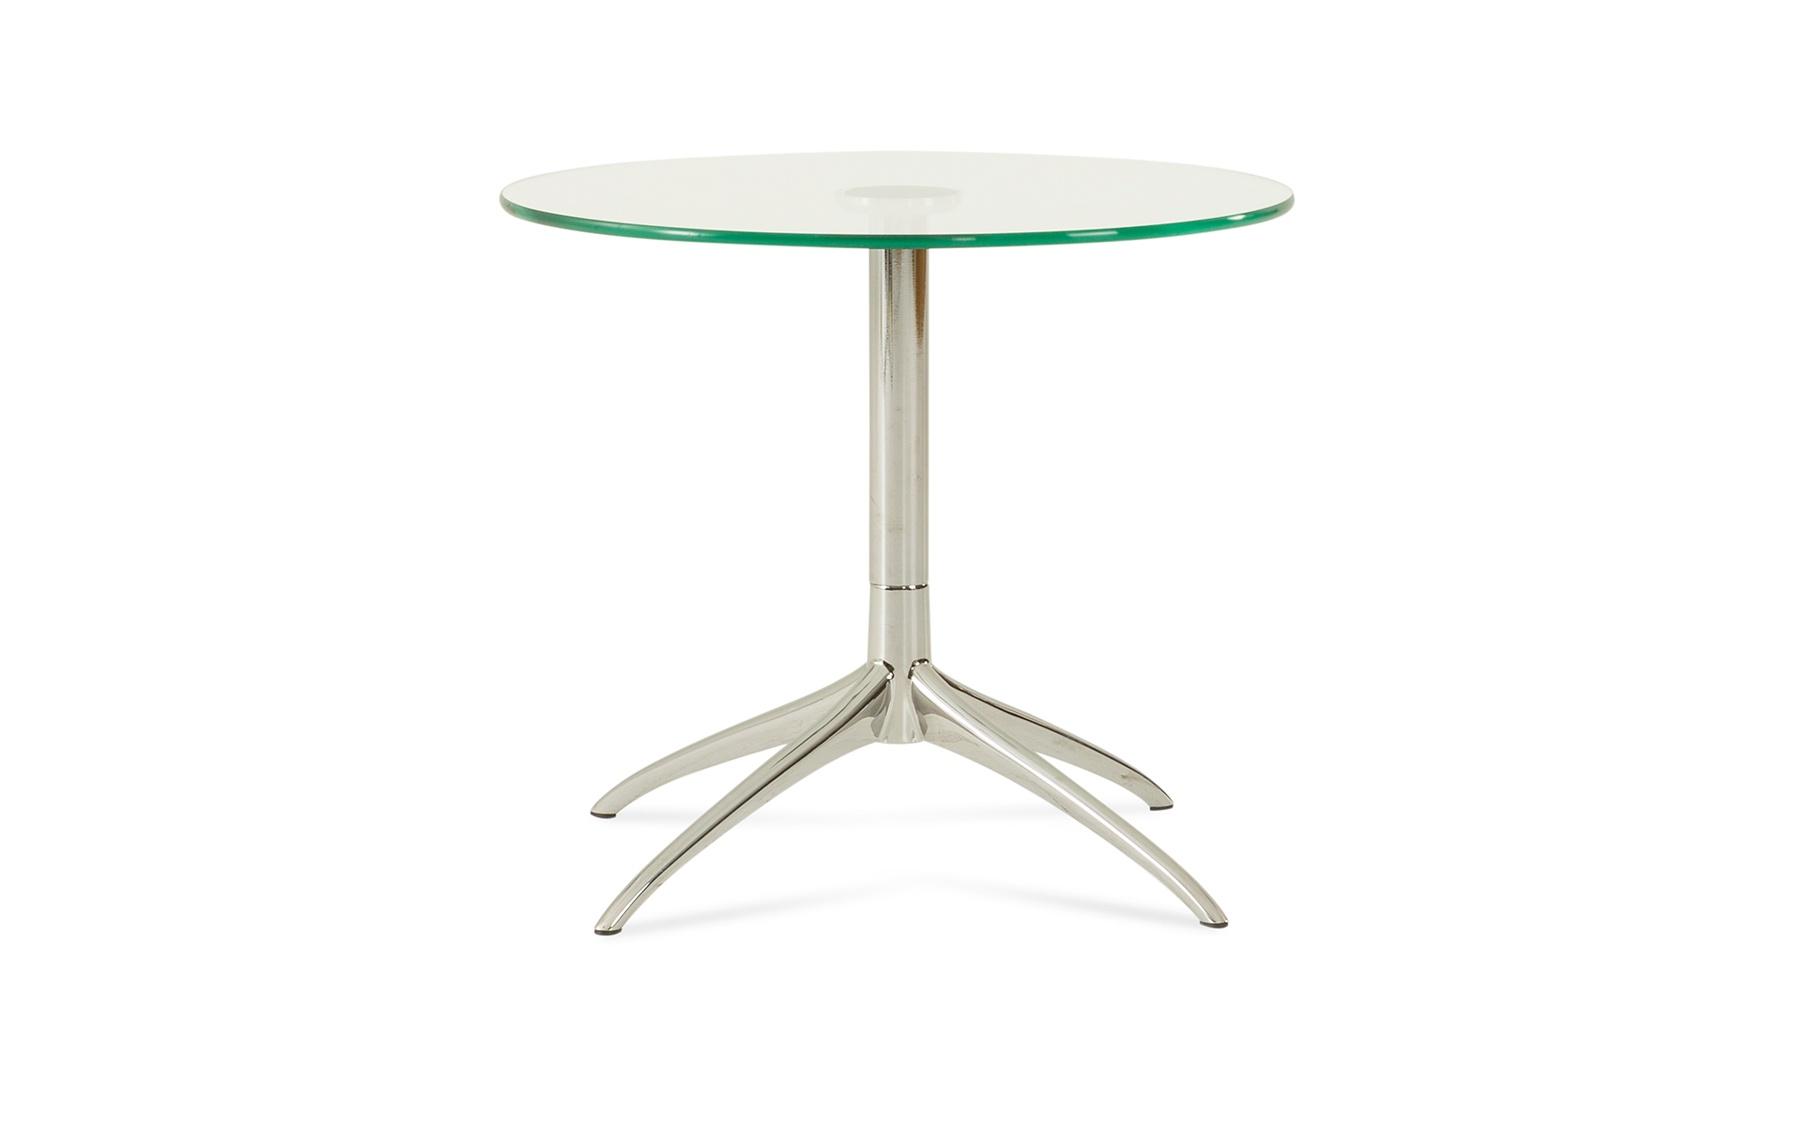 Table d 39 appoint 22x19 d244 tables d 39 appoint for Gallerie du meuble